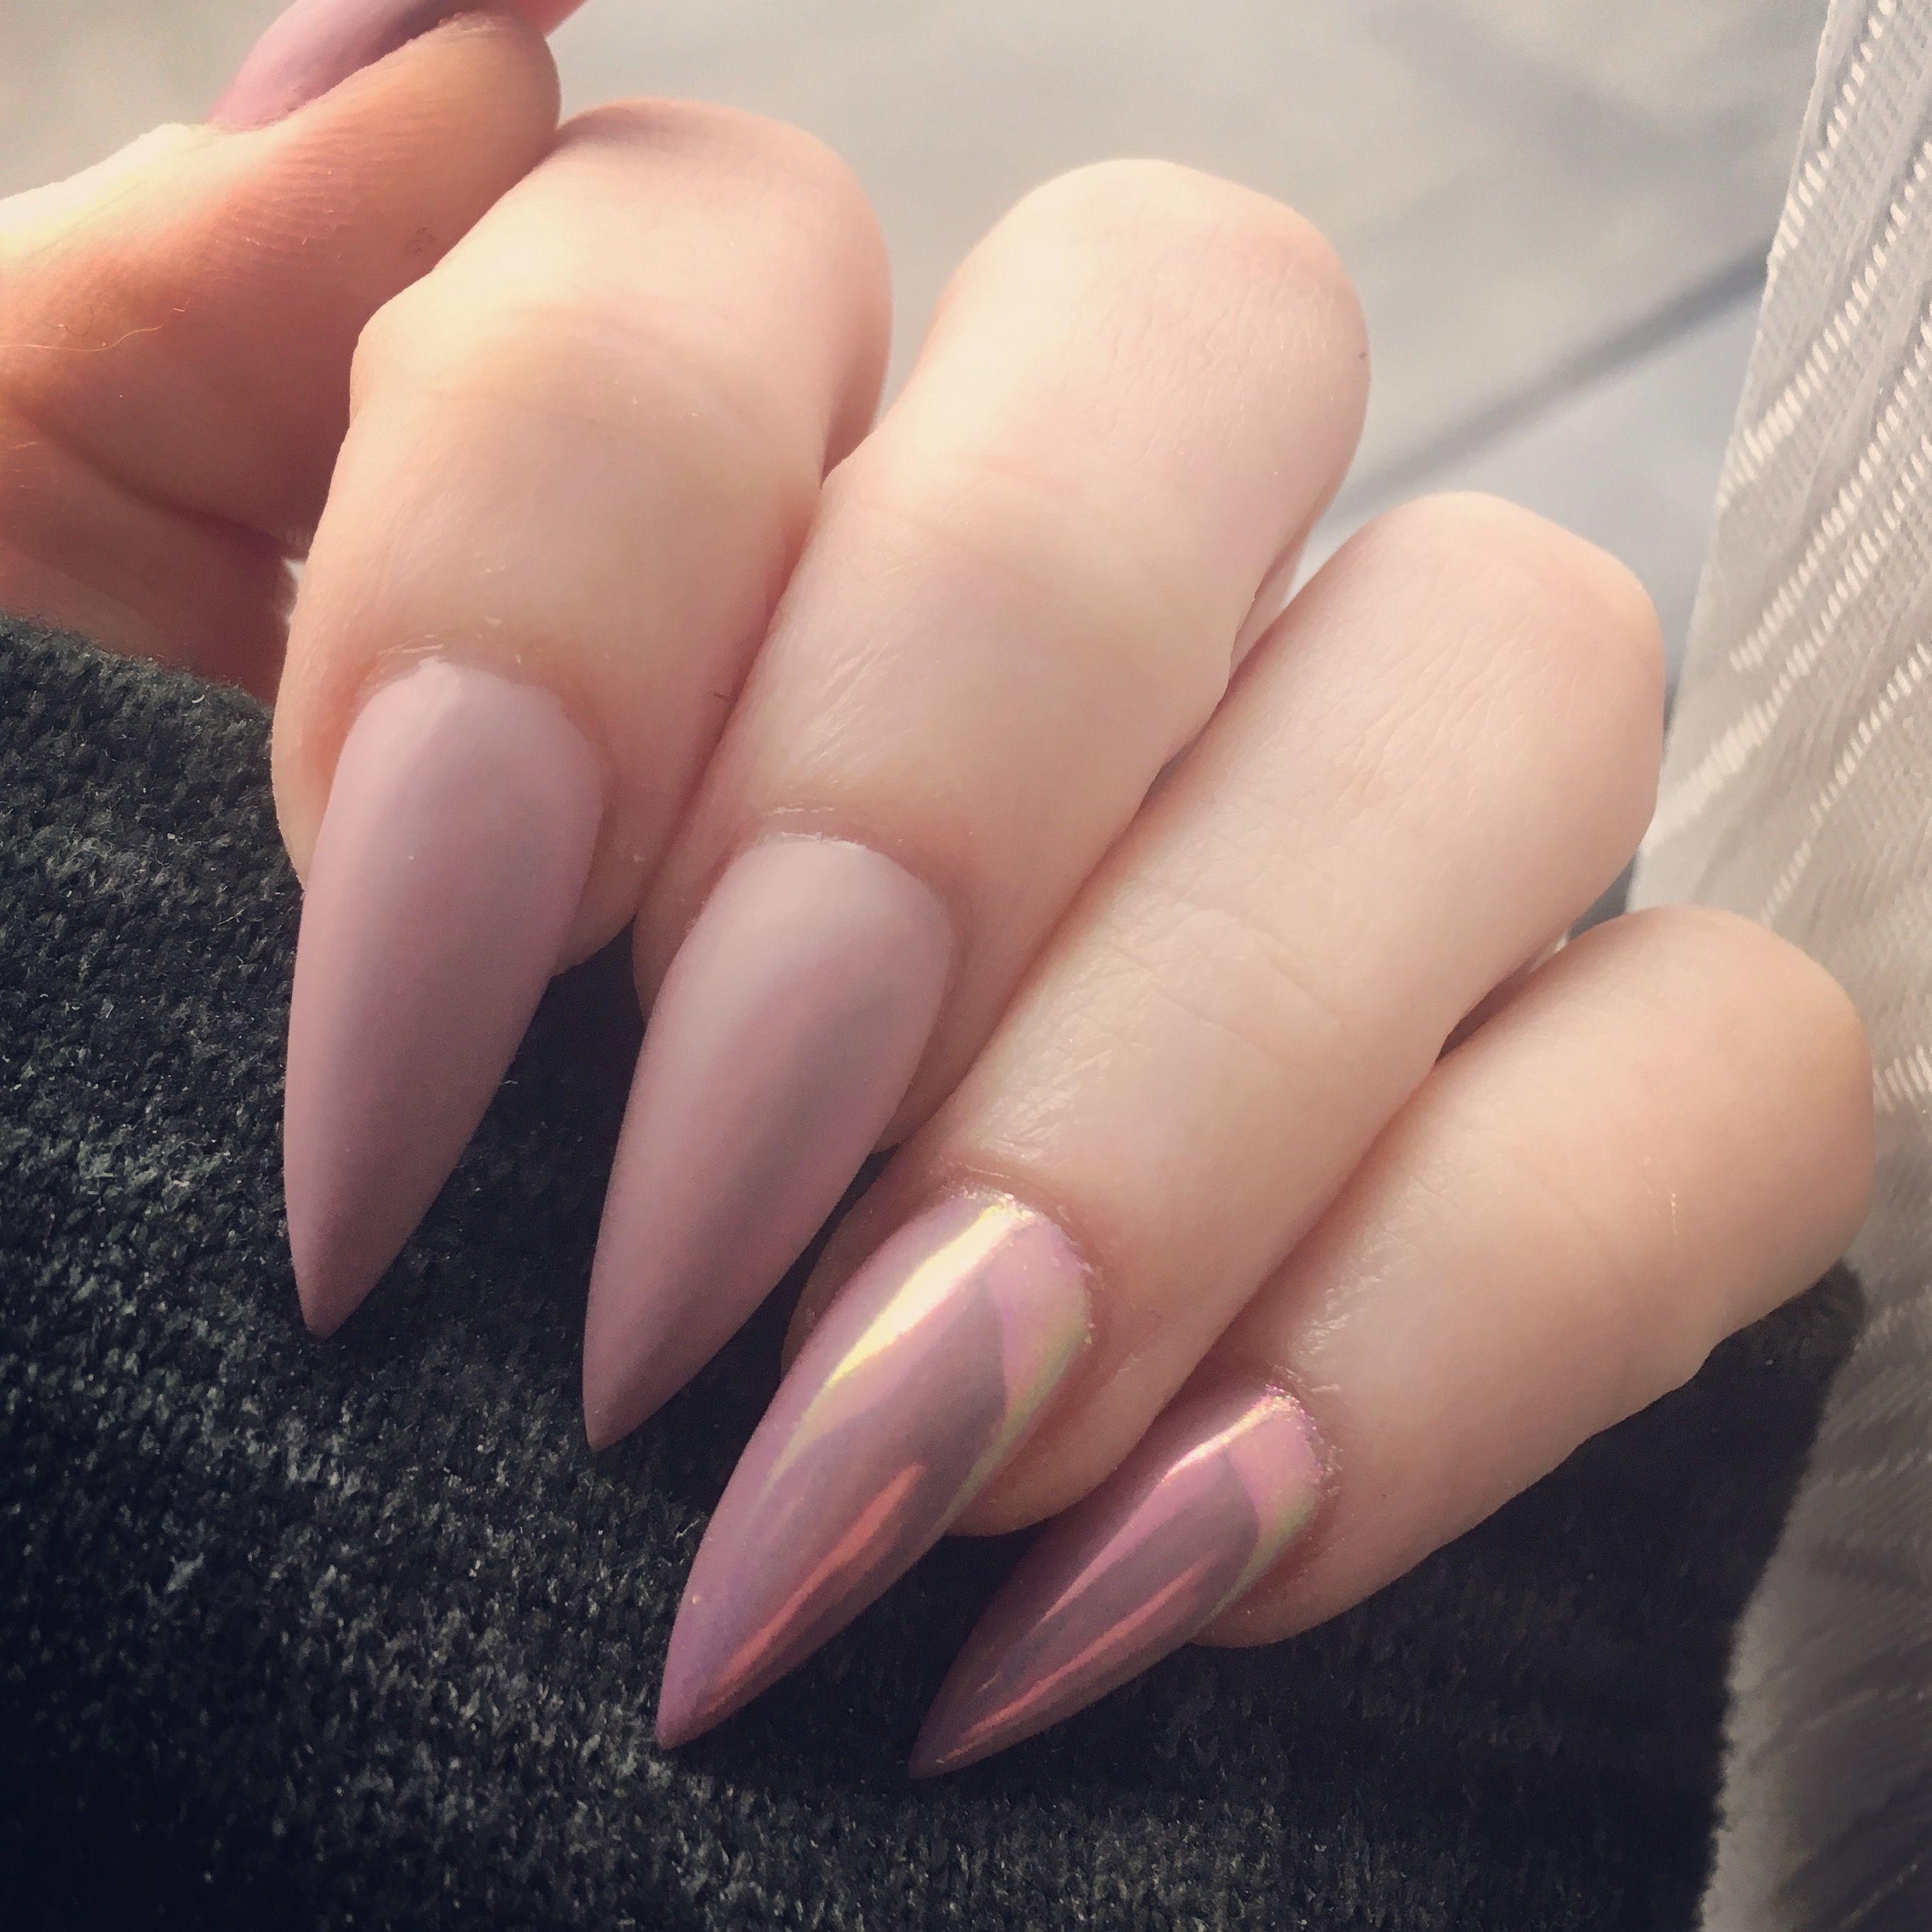 #nudenails #chromenails #naildesigns #nailinspiration ...